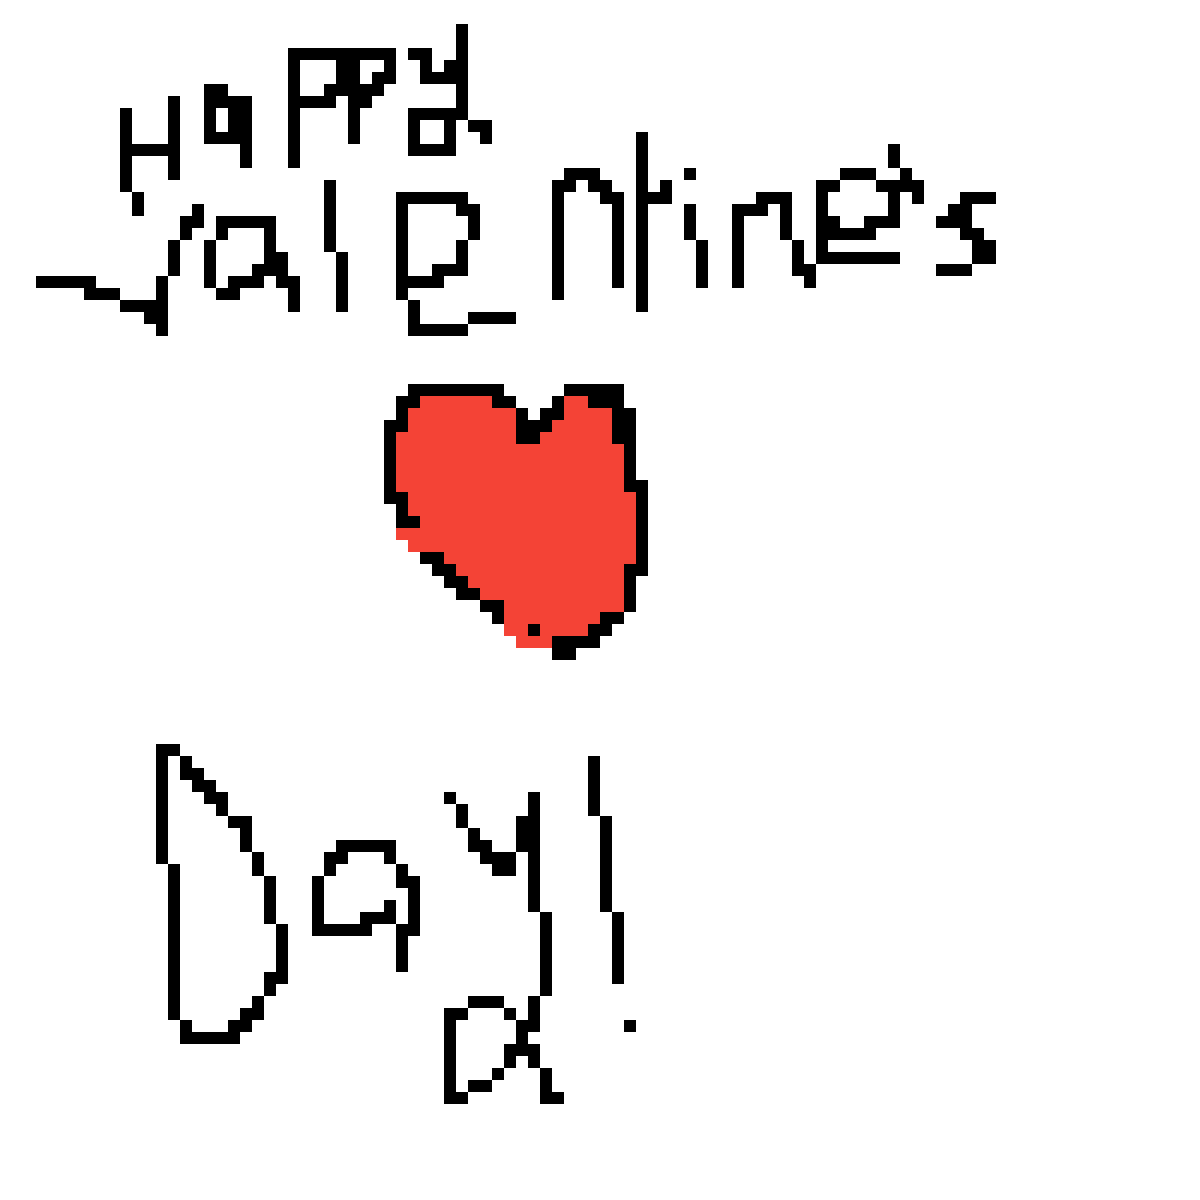 Happy Valentine's Day Everyone! by Jax101